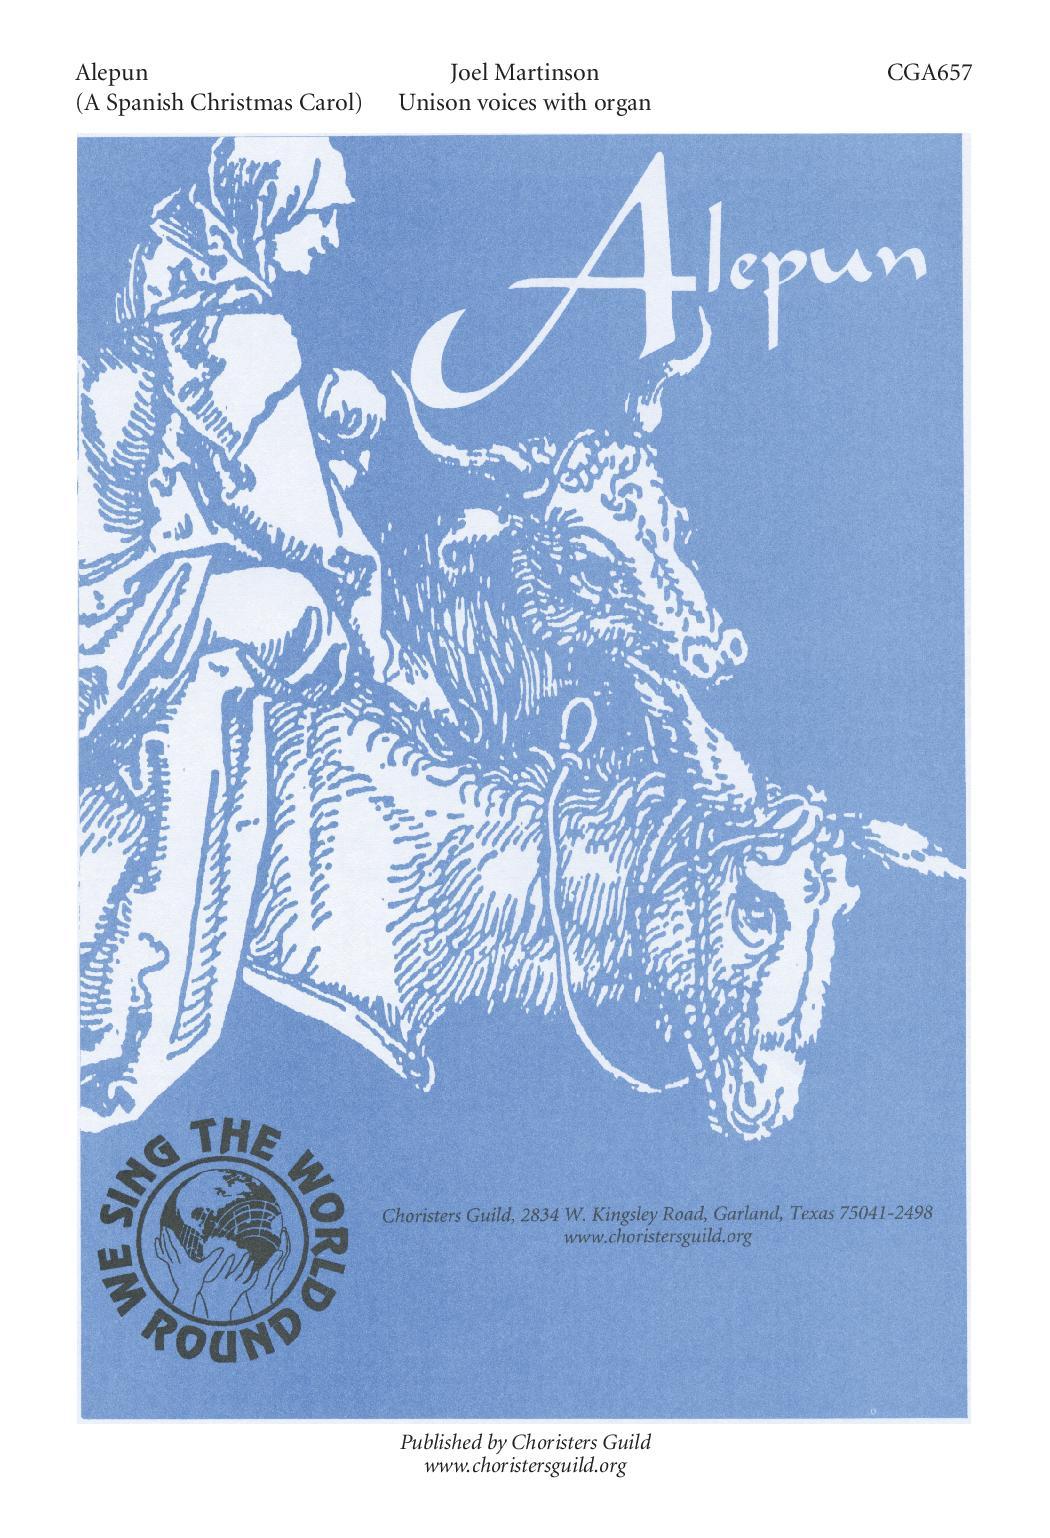 Alepun, A Spanish Christmas Carol